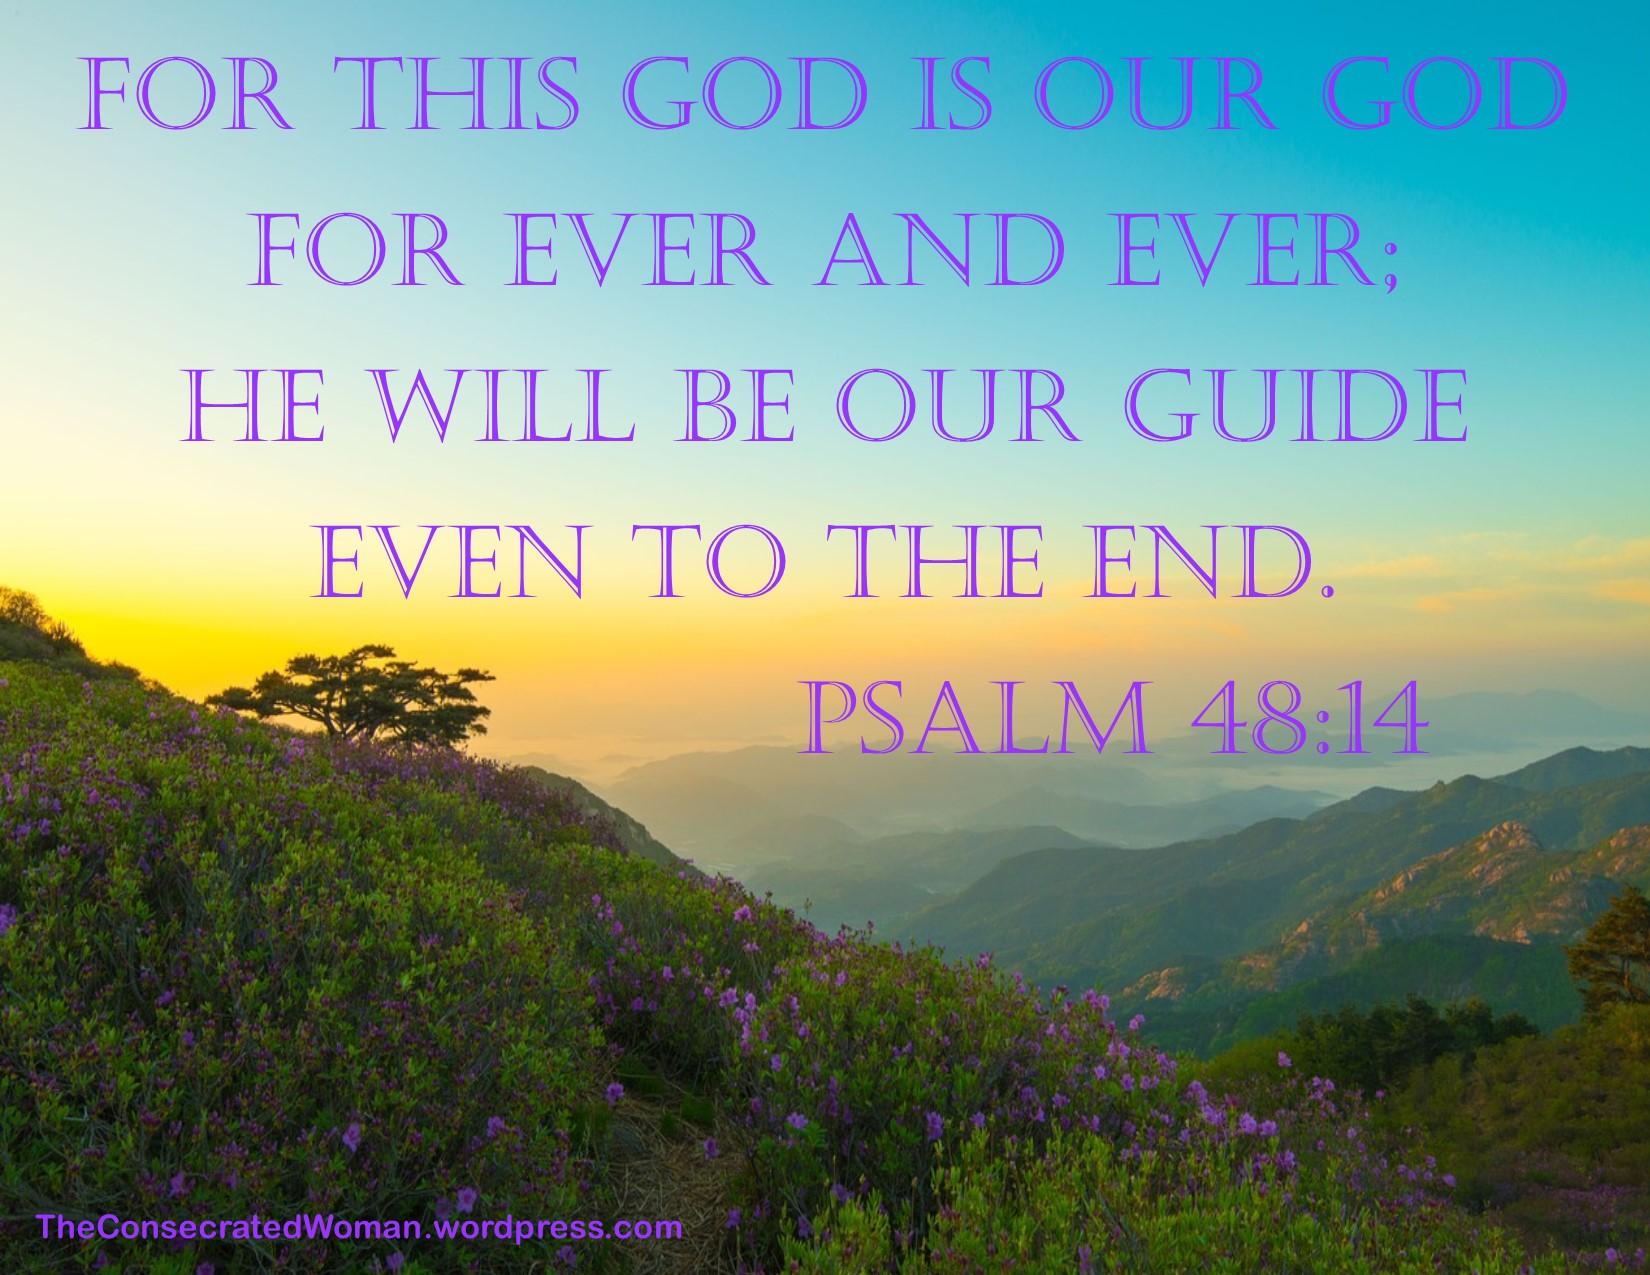 Psalm 48 14